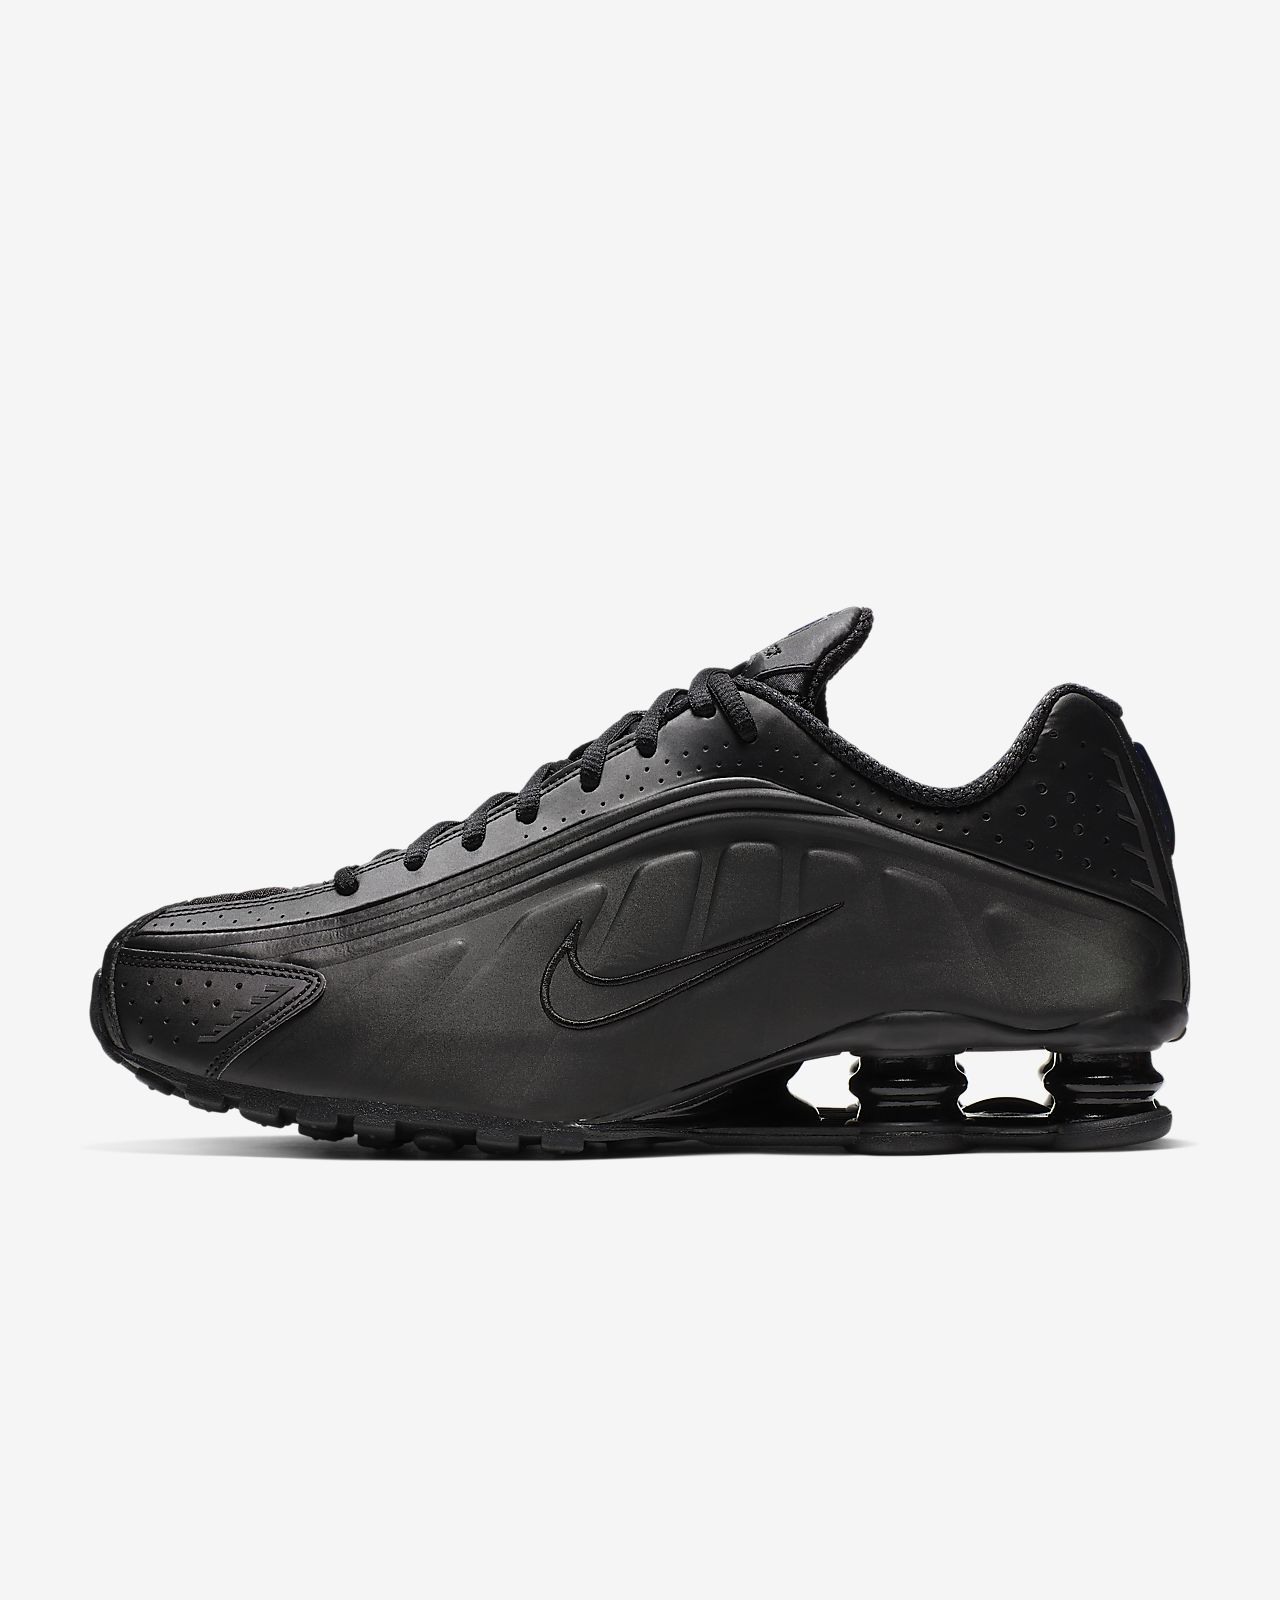 Nike Shox R4 cipő